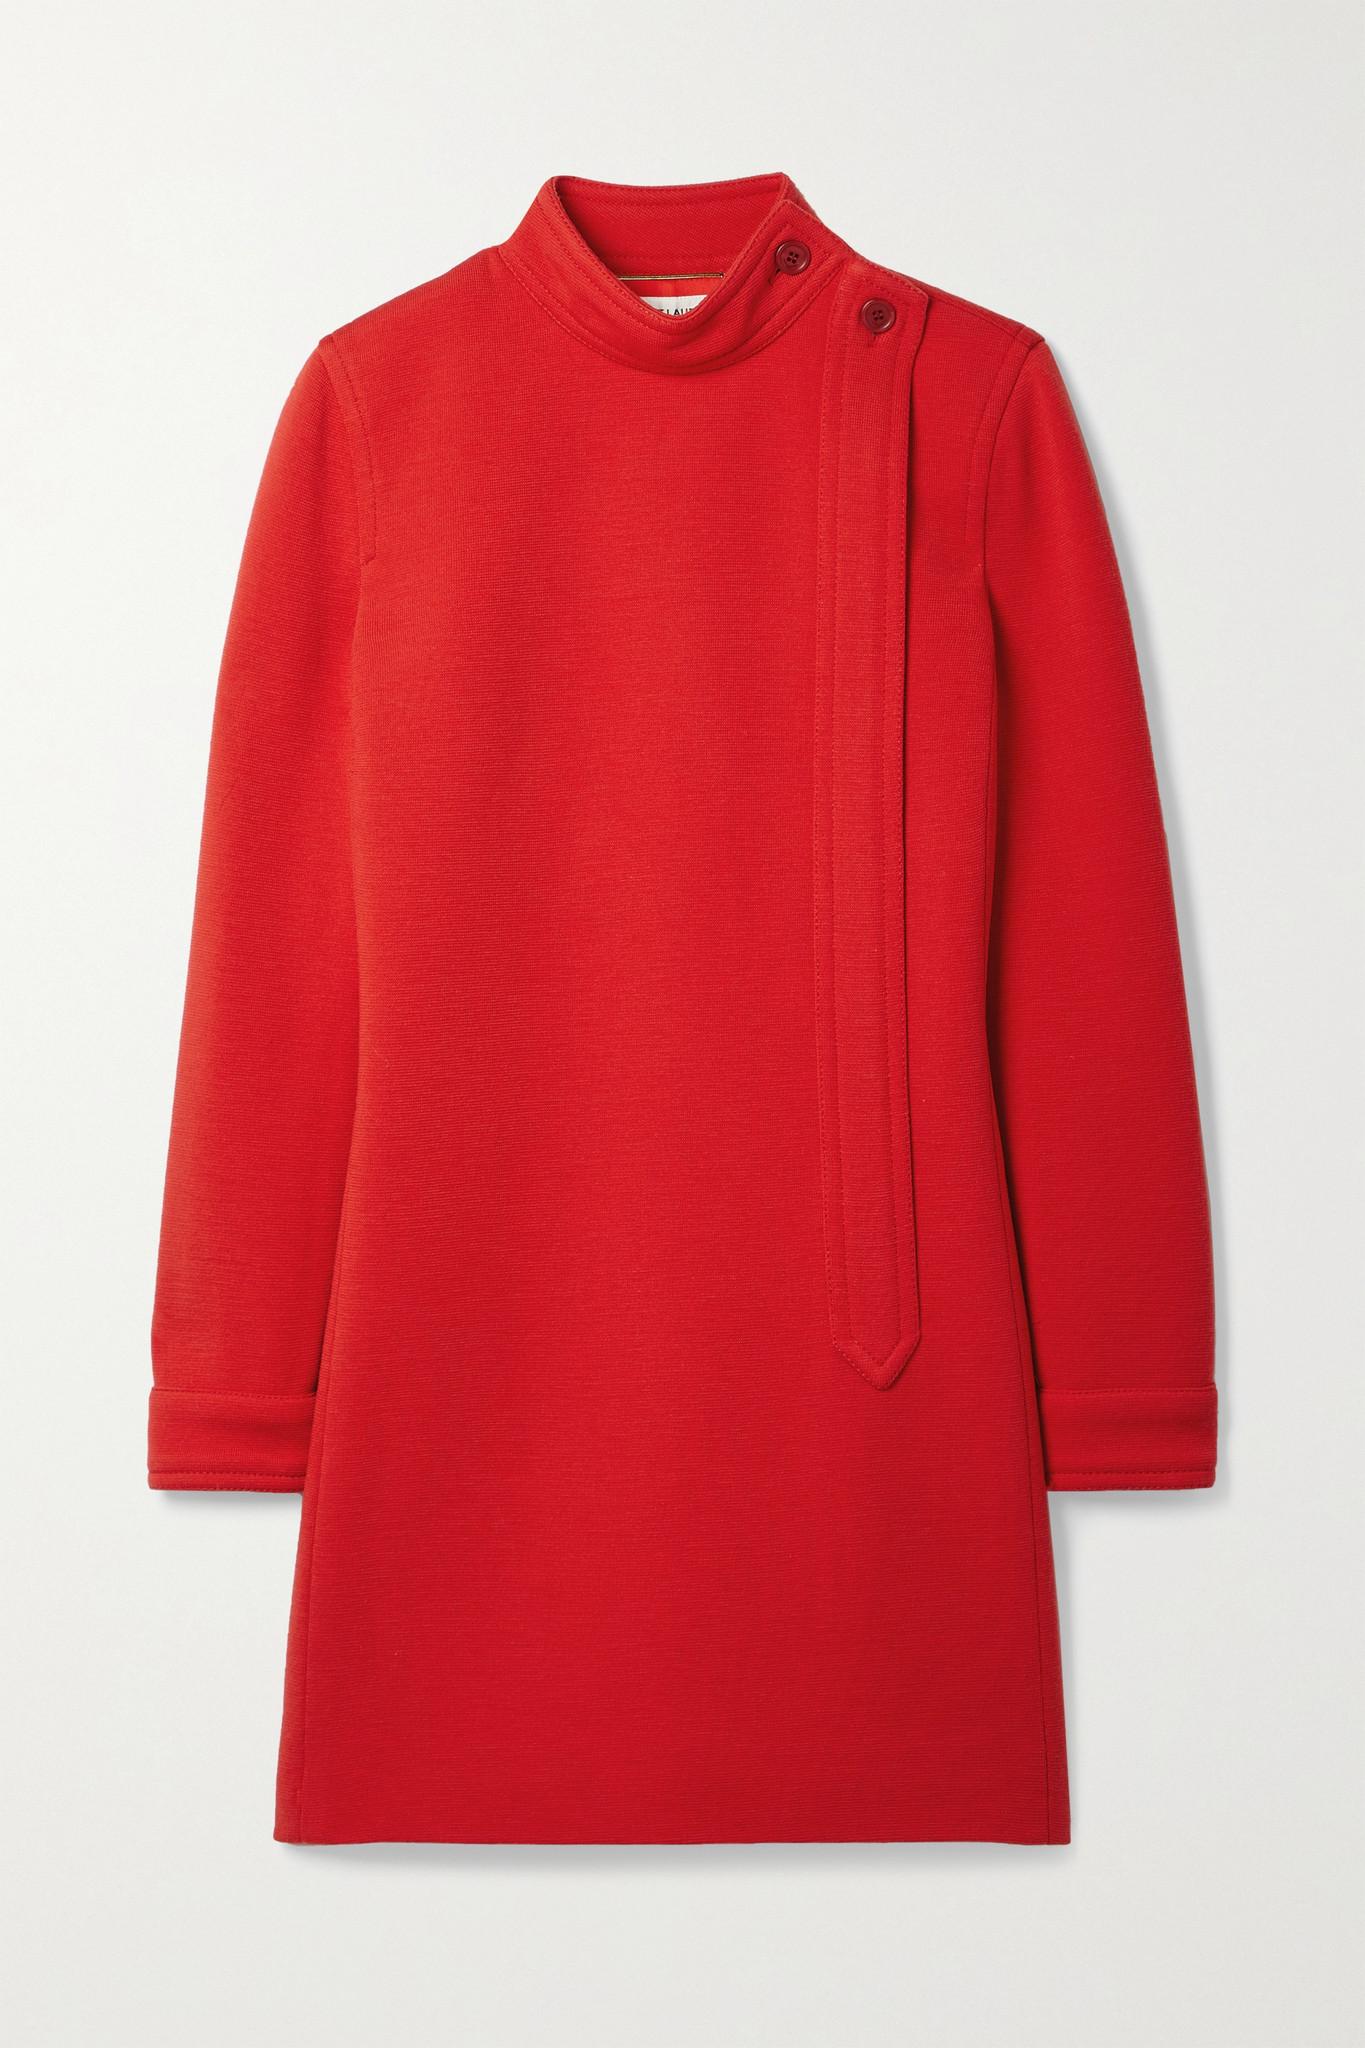 SAINT LAURENT - Wool-blend Mini Dress - Red - FR36